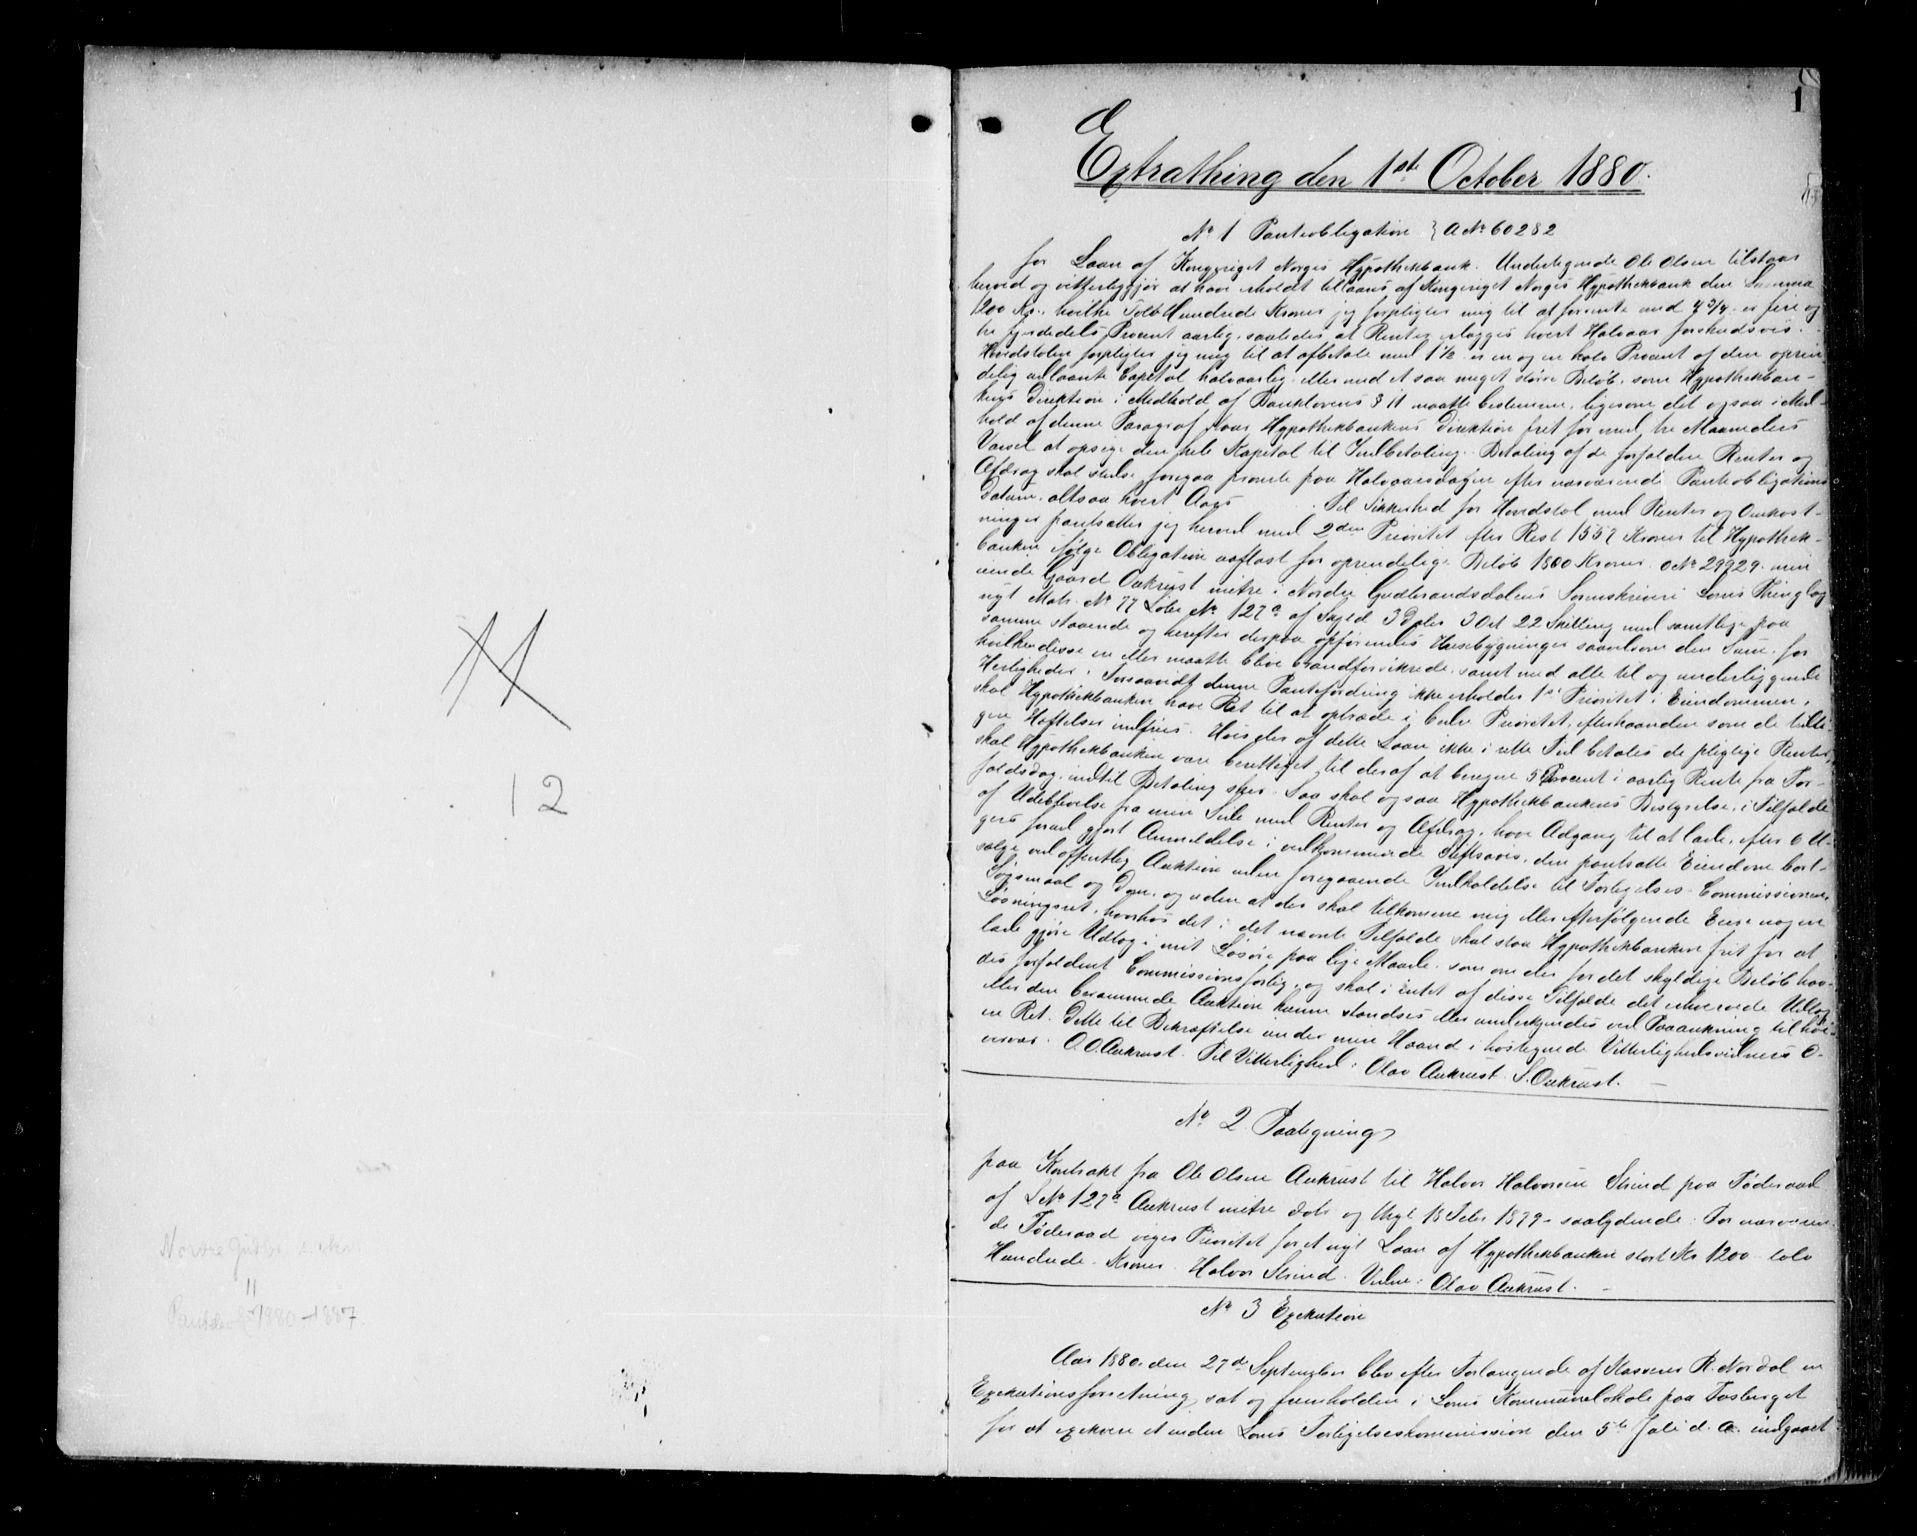 SAH, Nord-Gudbrandsdal tingrett, H/Hb/Hba/L0011: Pantebok nr. 11, 1880-1887, s. 1